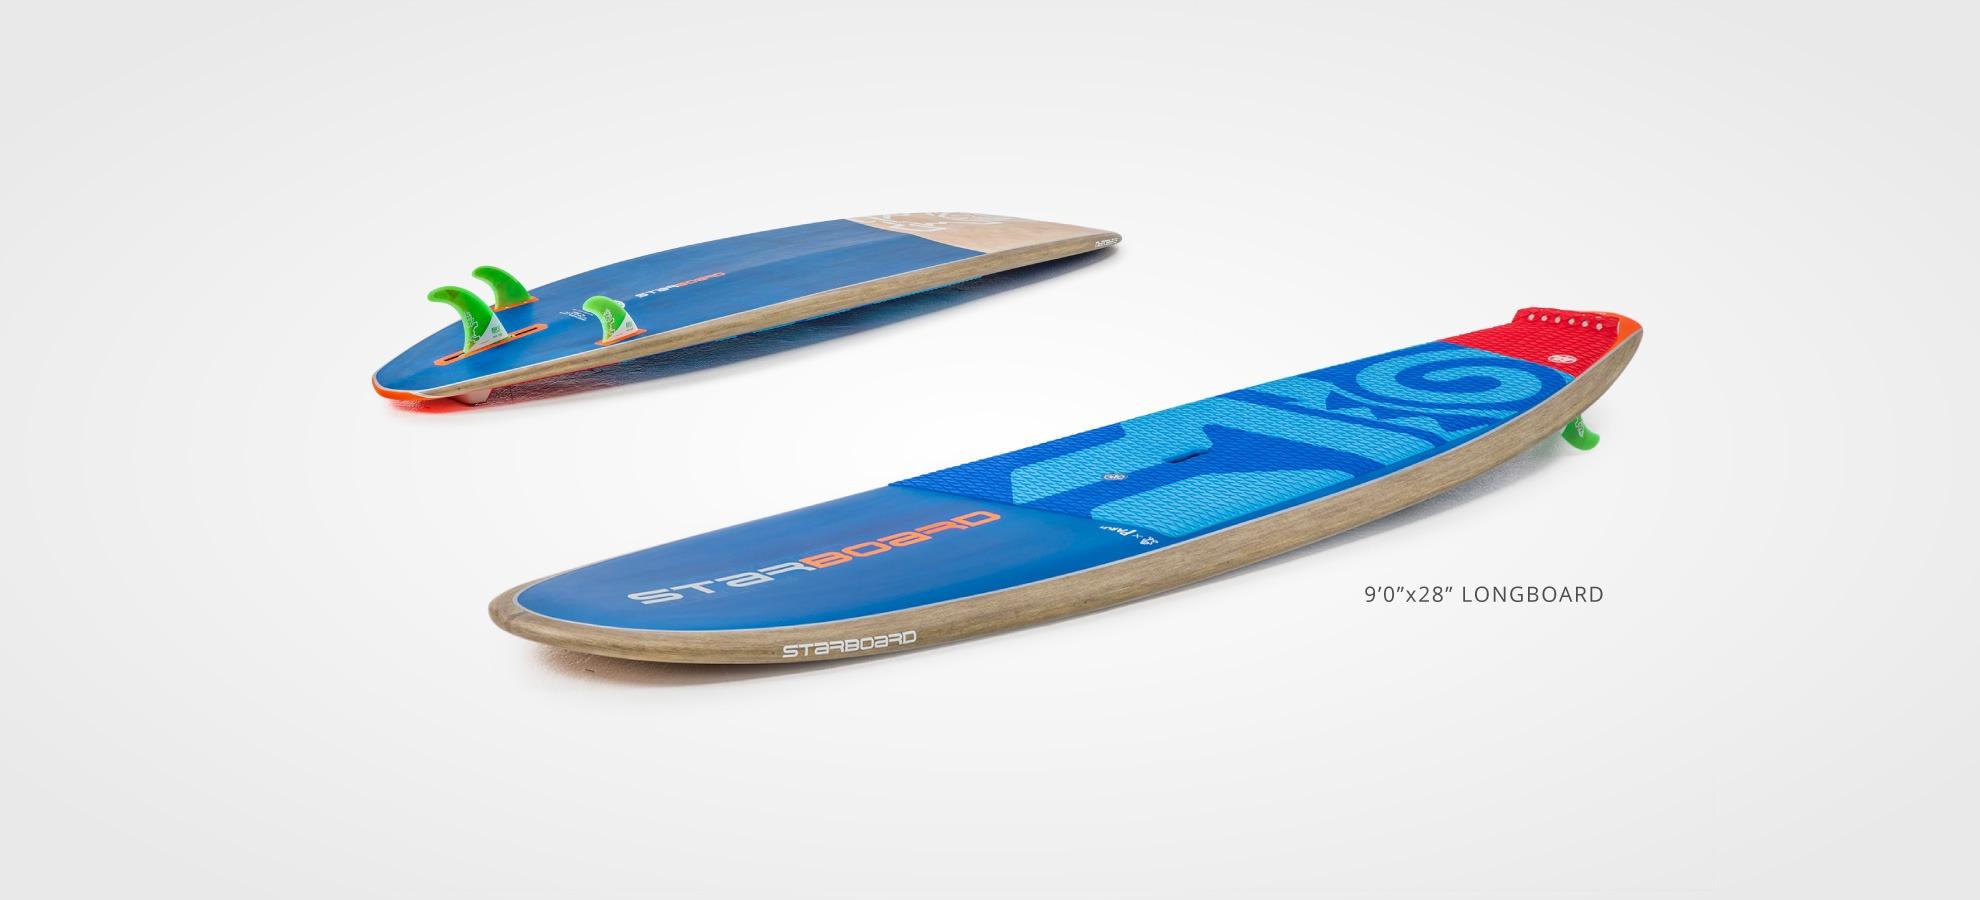 The New Starboard Longboard